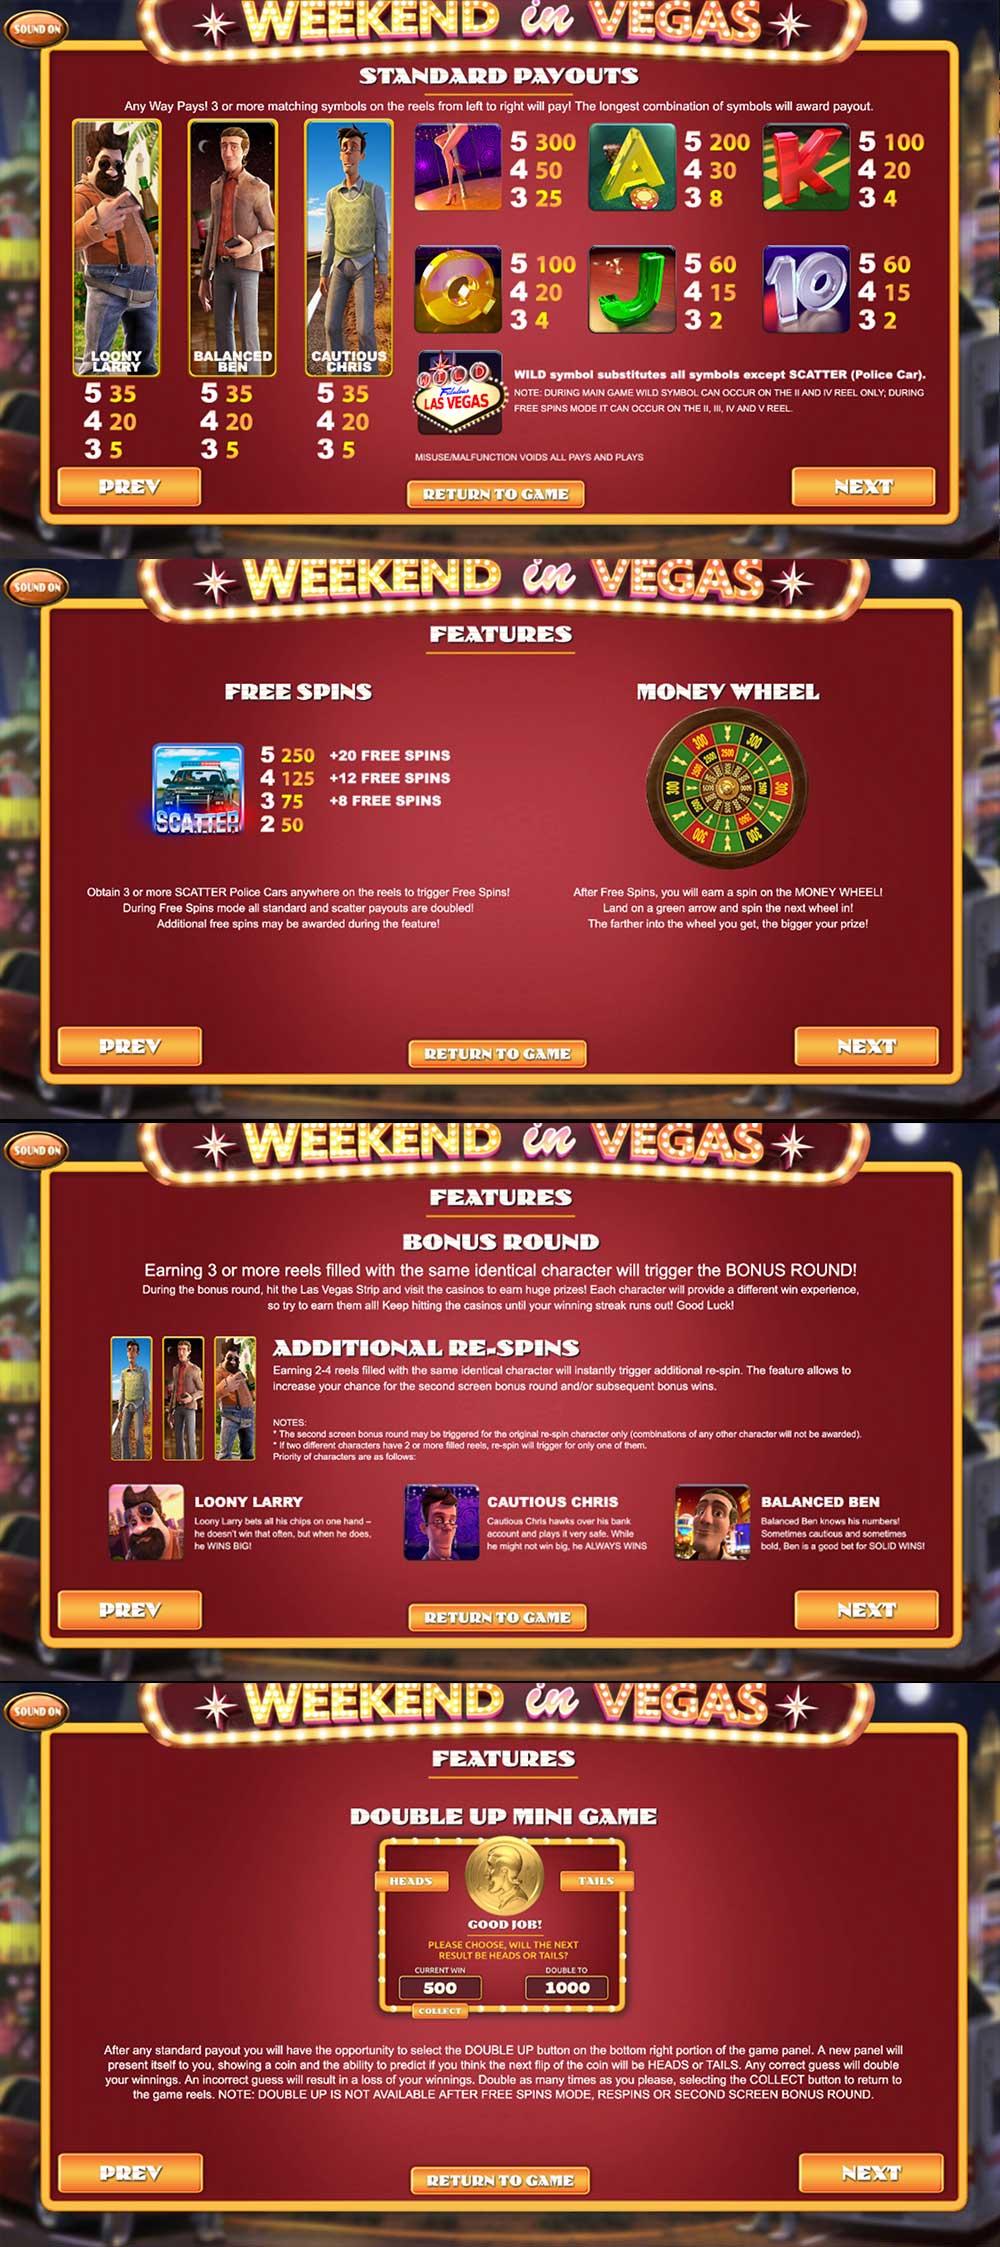 Weekend In Vegas Pay Table Screenshot, Big Dollar Casino